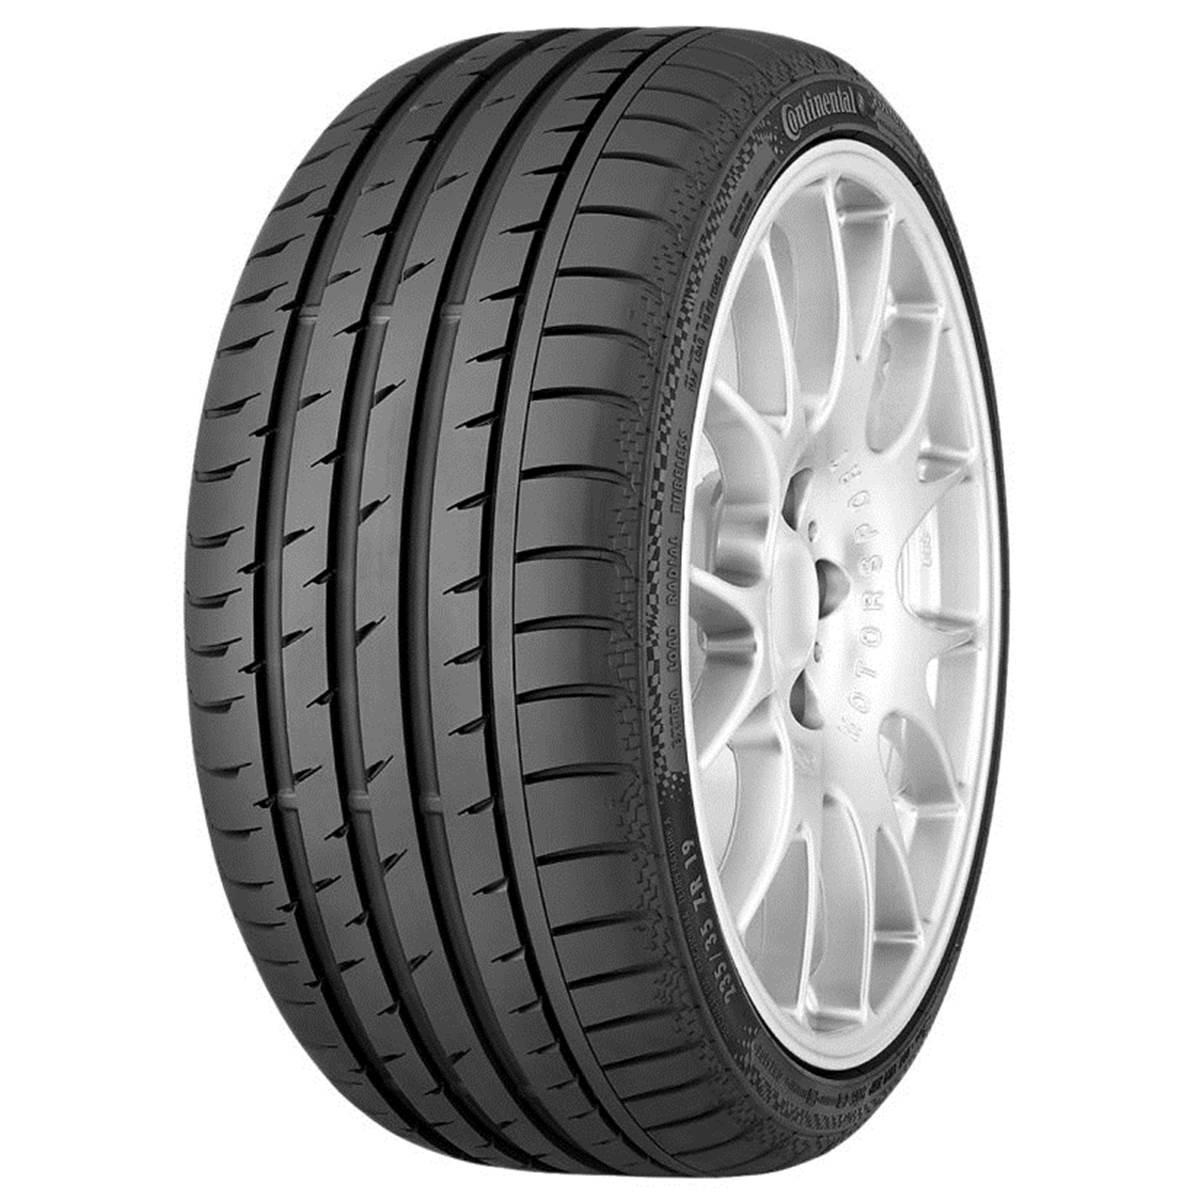 Comparer les prix des pneus Continental Conti Sport Contact 3